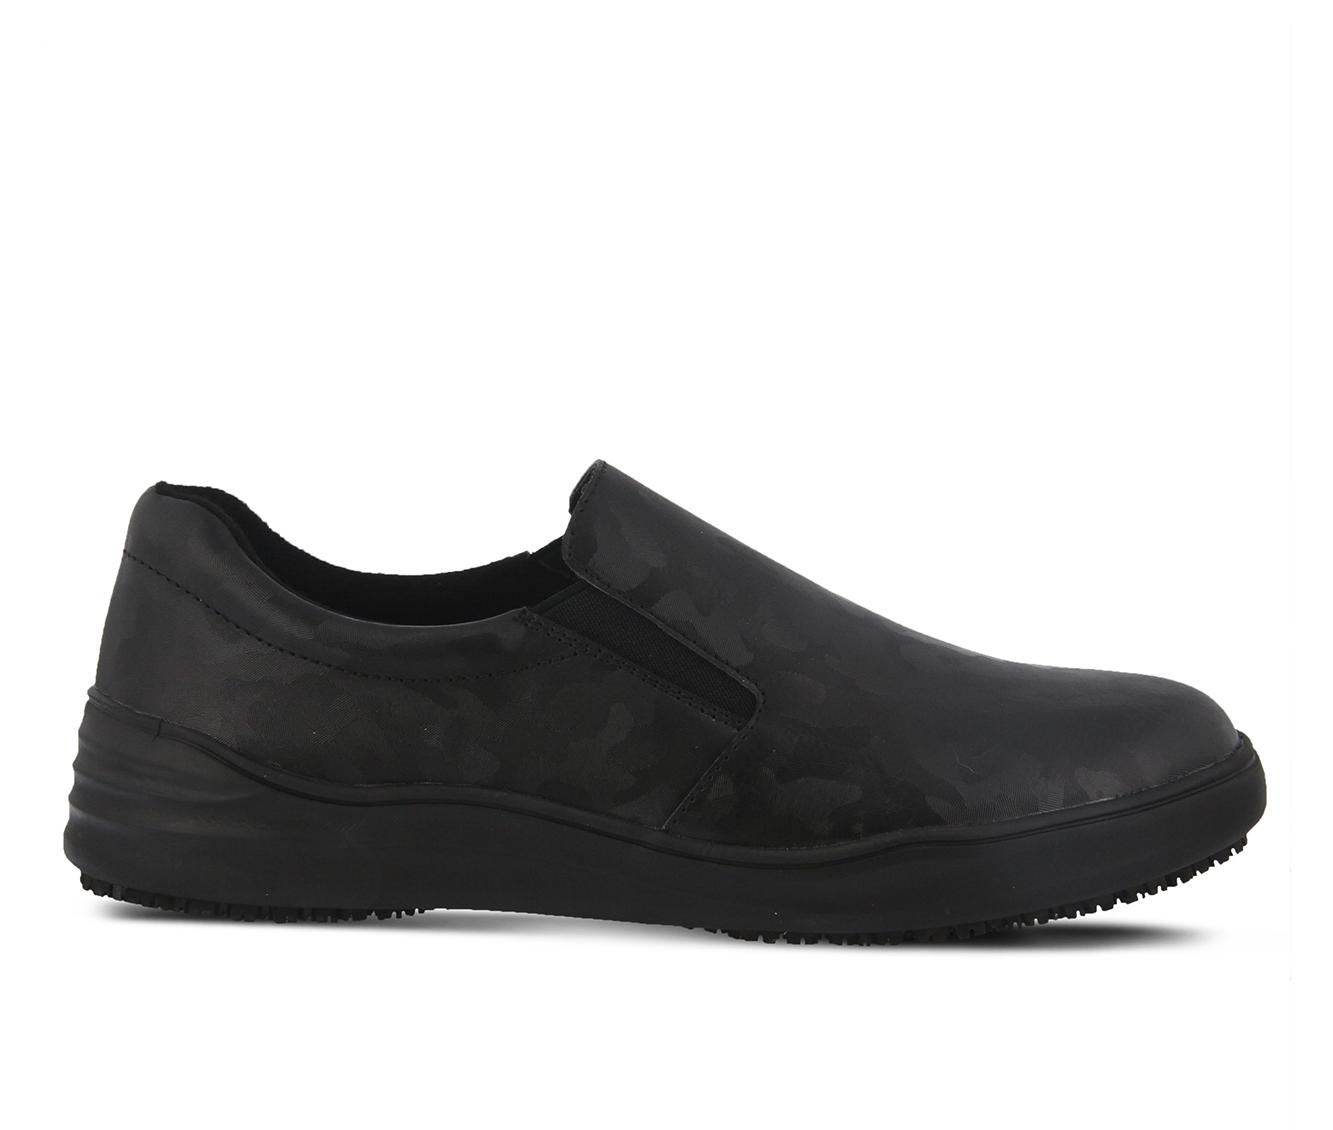 SPRING STEP Waevo Camo Men's Boots (Black - Leather)